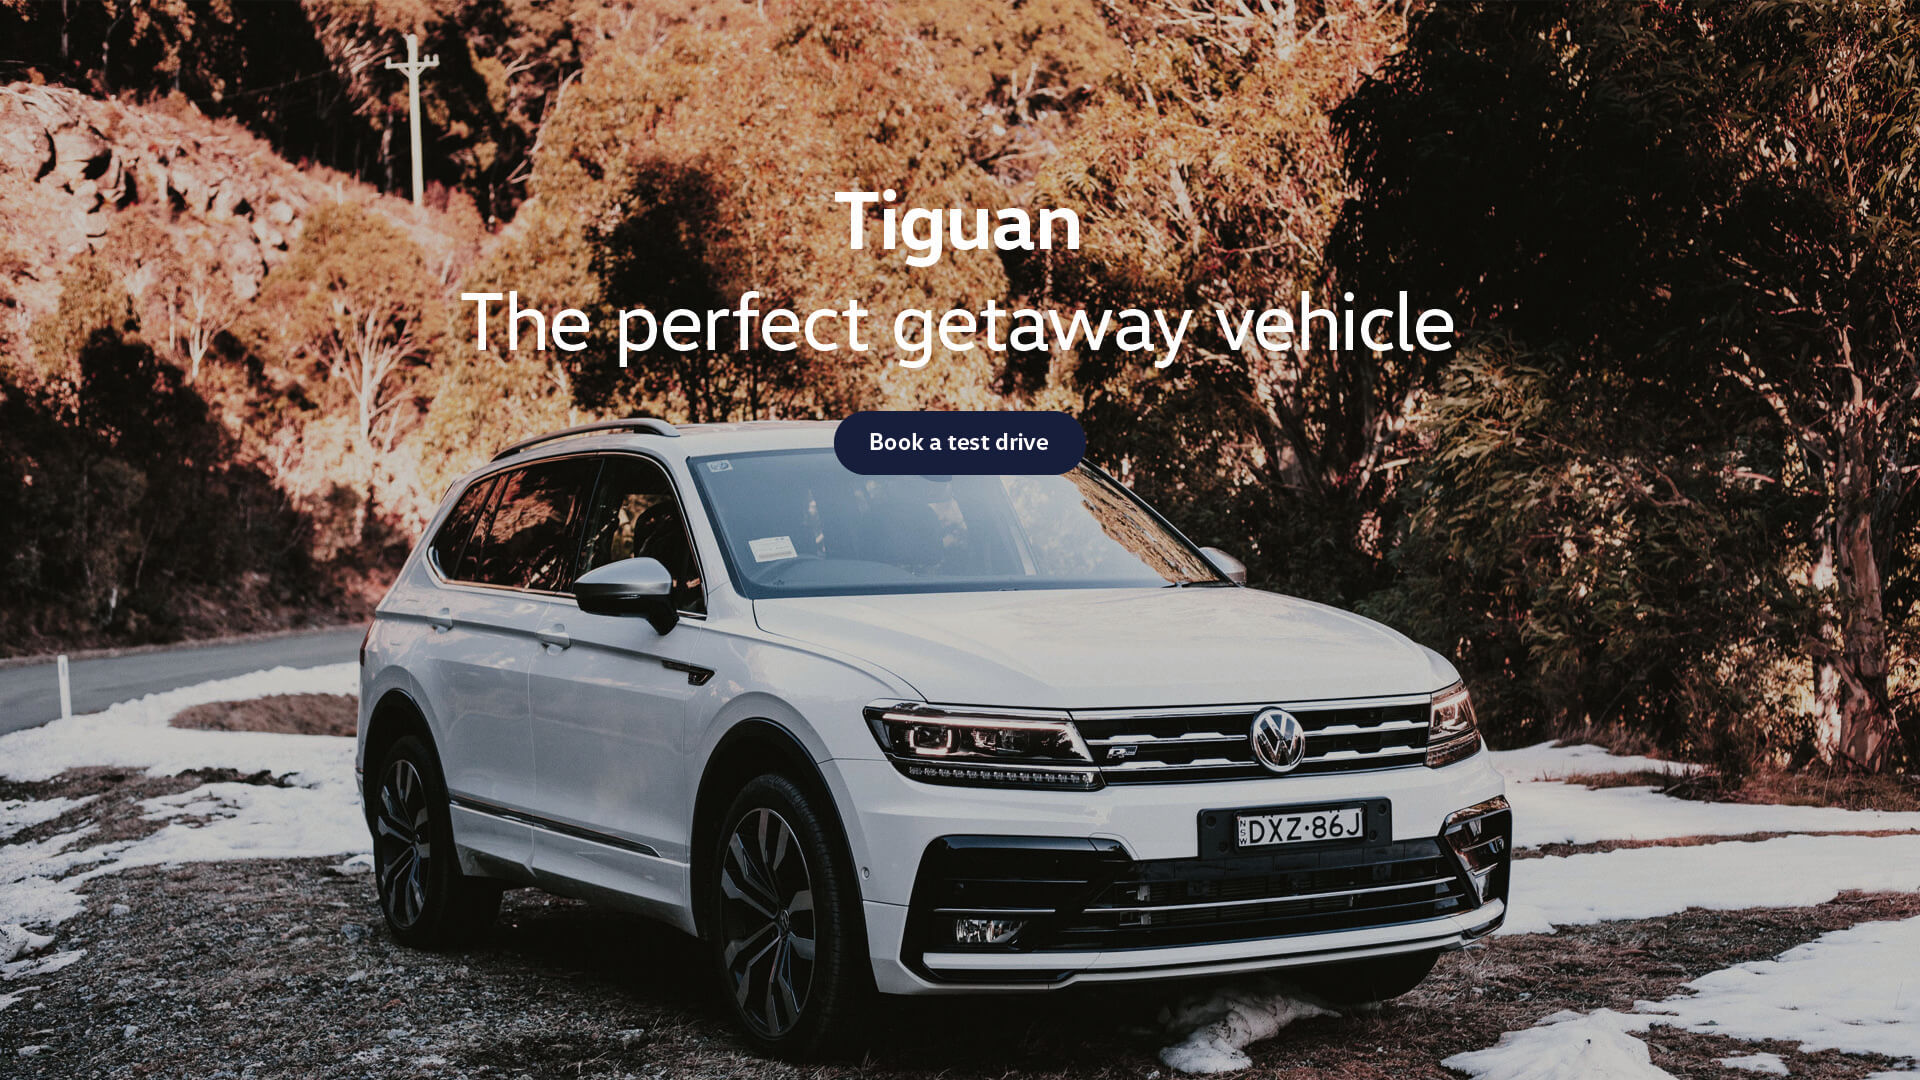 Volkswagen Tiguan. The perfect getaway vehicle. Test drive today at Shepparton Volkswagen